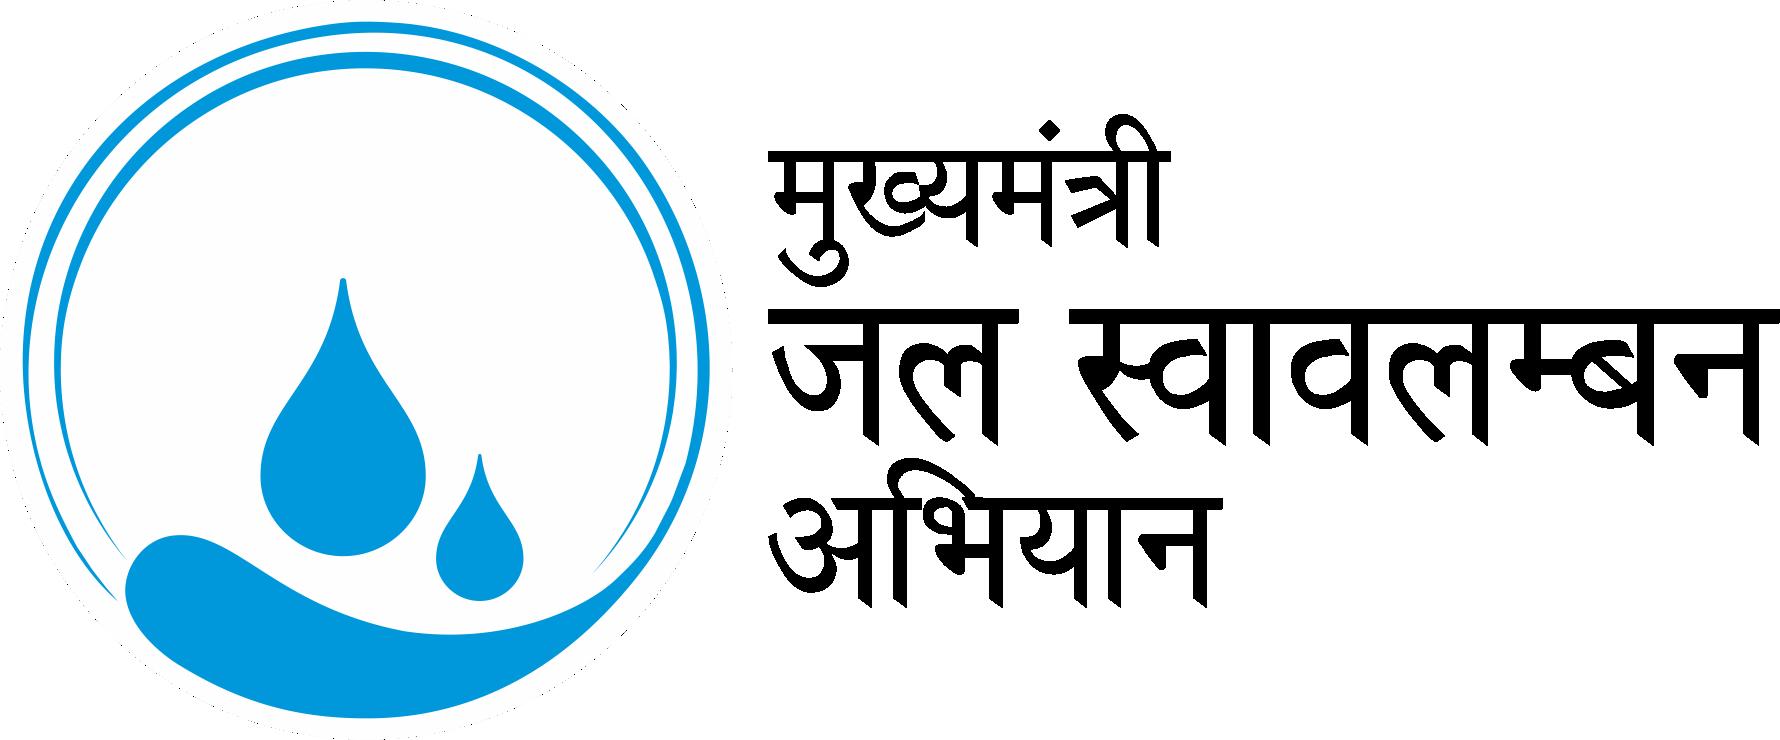 Mukhyamantri_Jal_Swavlamban_logo